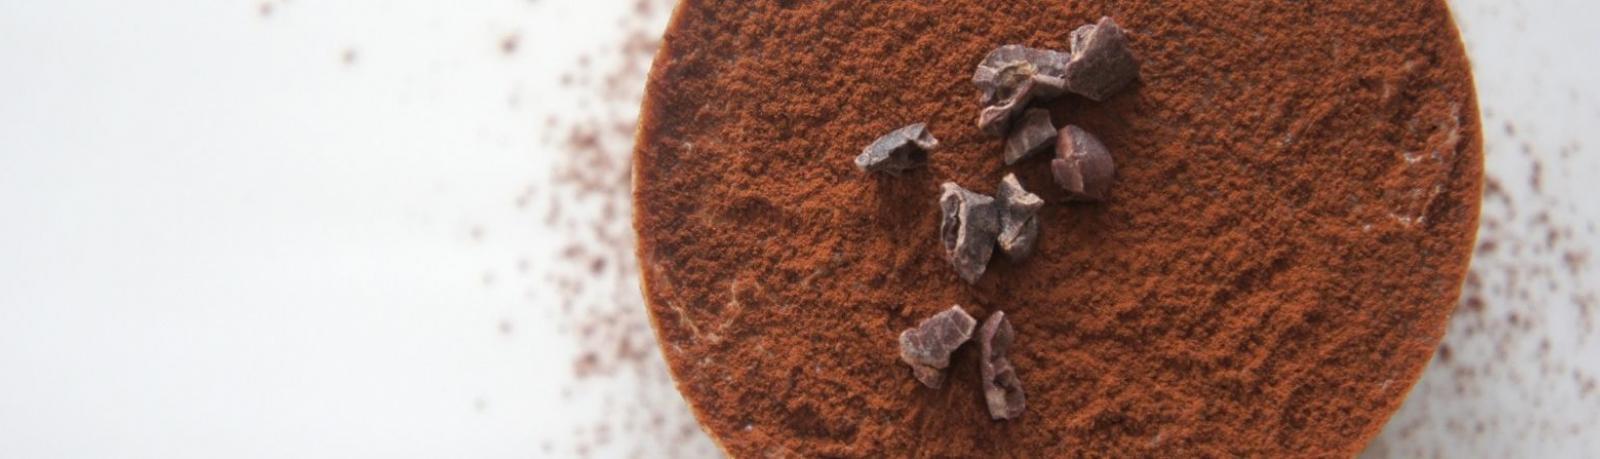 Gâteau au chocolat, gourmandise céréalière